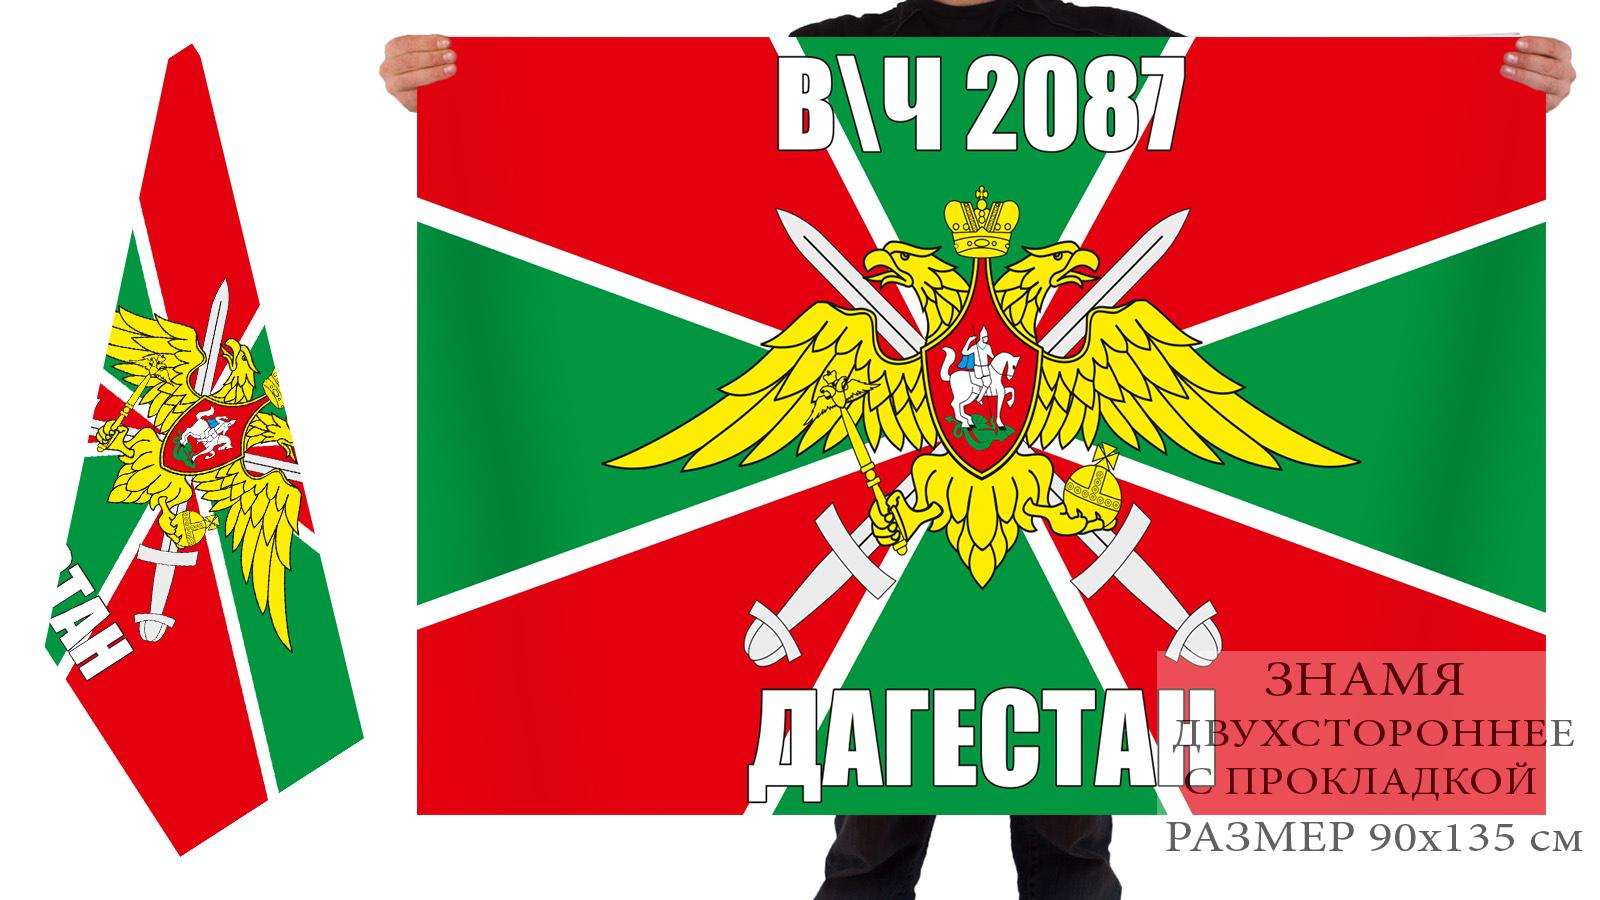 Двусторонний флаг воинской части 2087